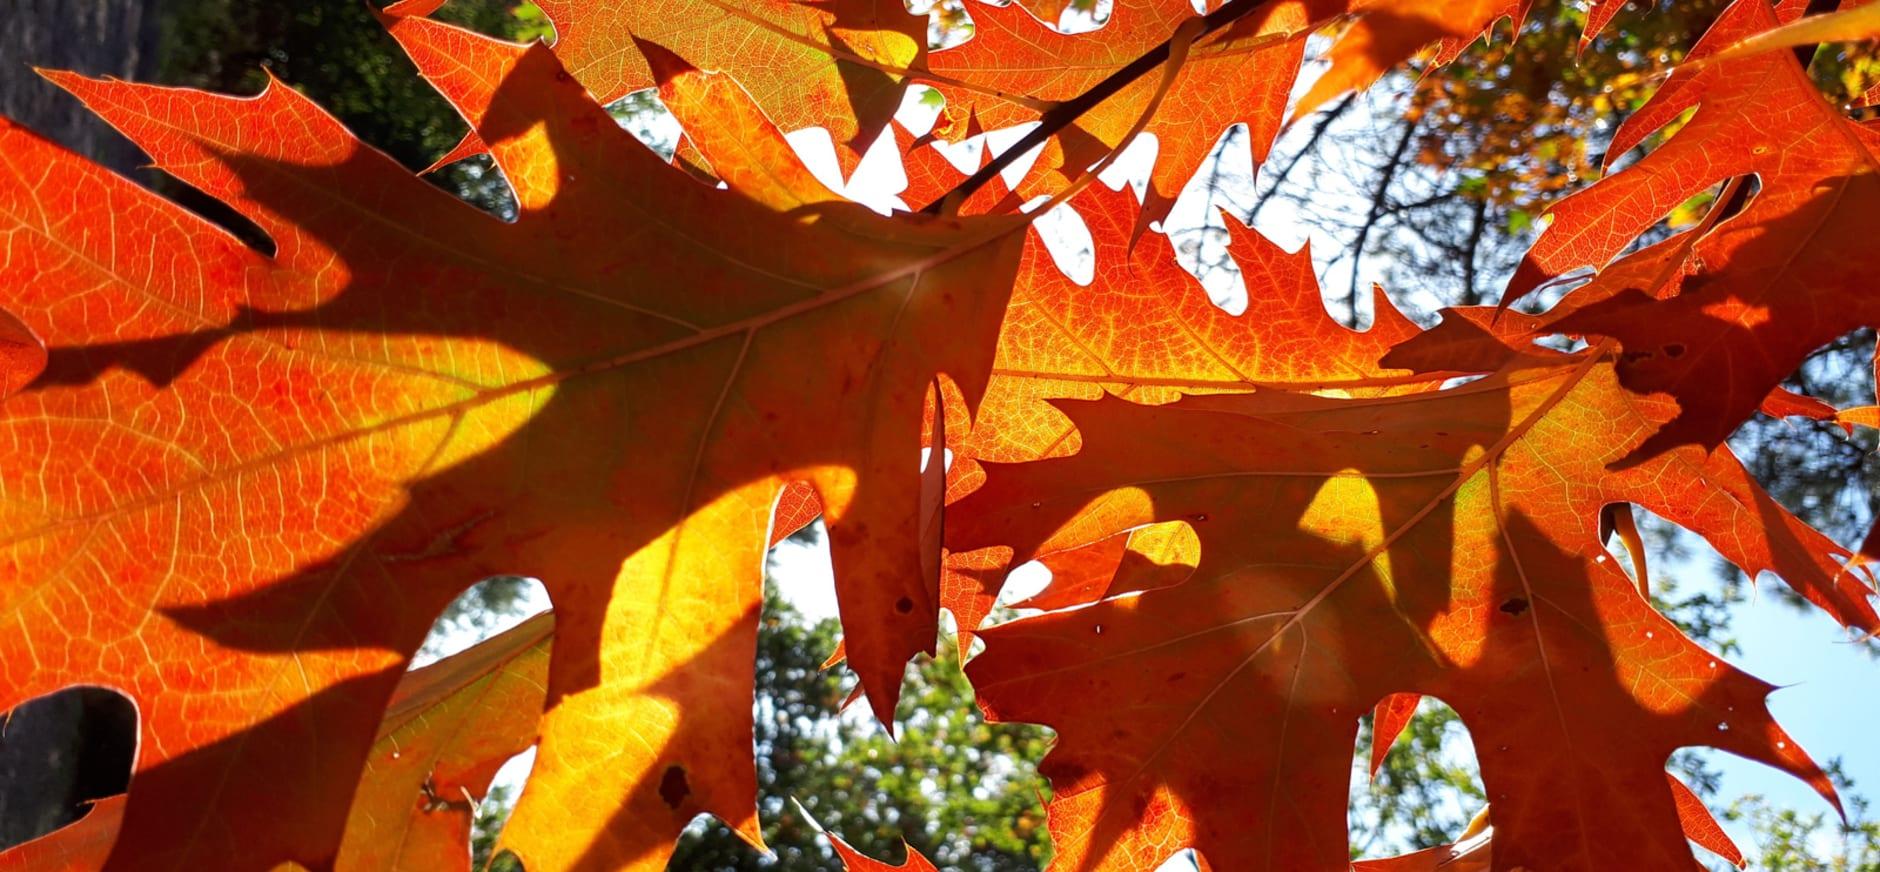 Bladeren Amerikaanse eik in herfstkleuren